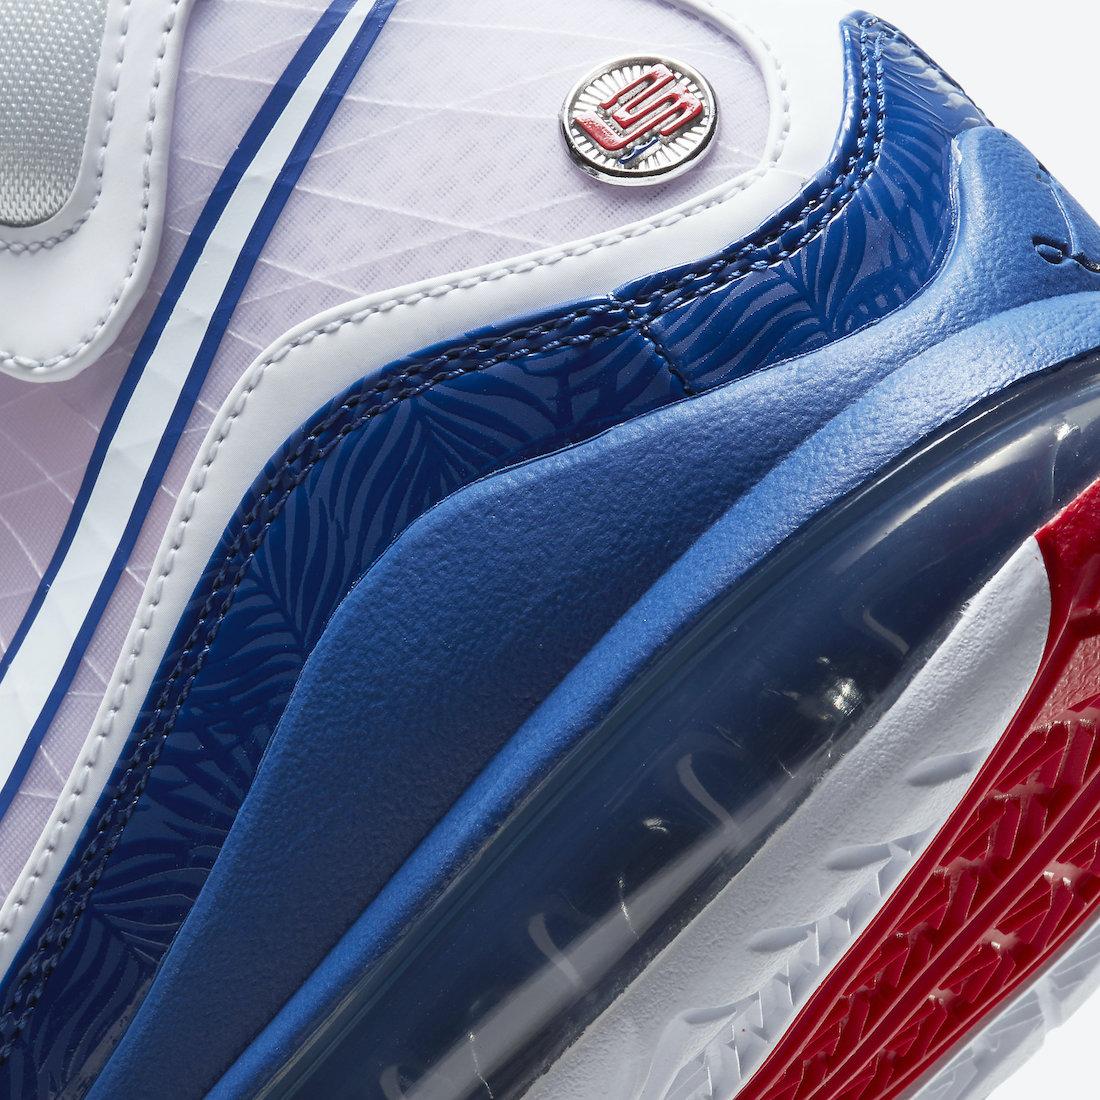 Nike-LeBron-7-Dodgers-DJ5158-100-2021-Release-Date-7